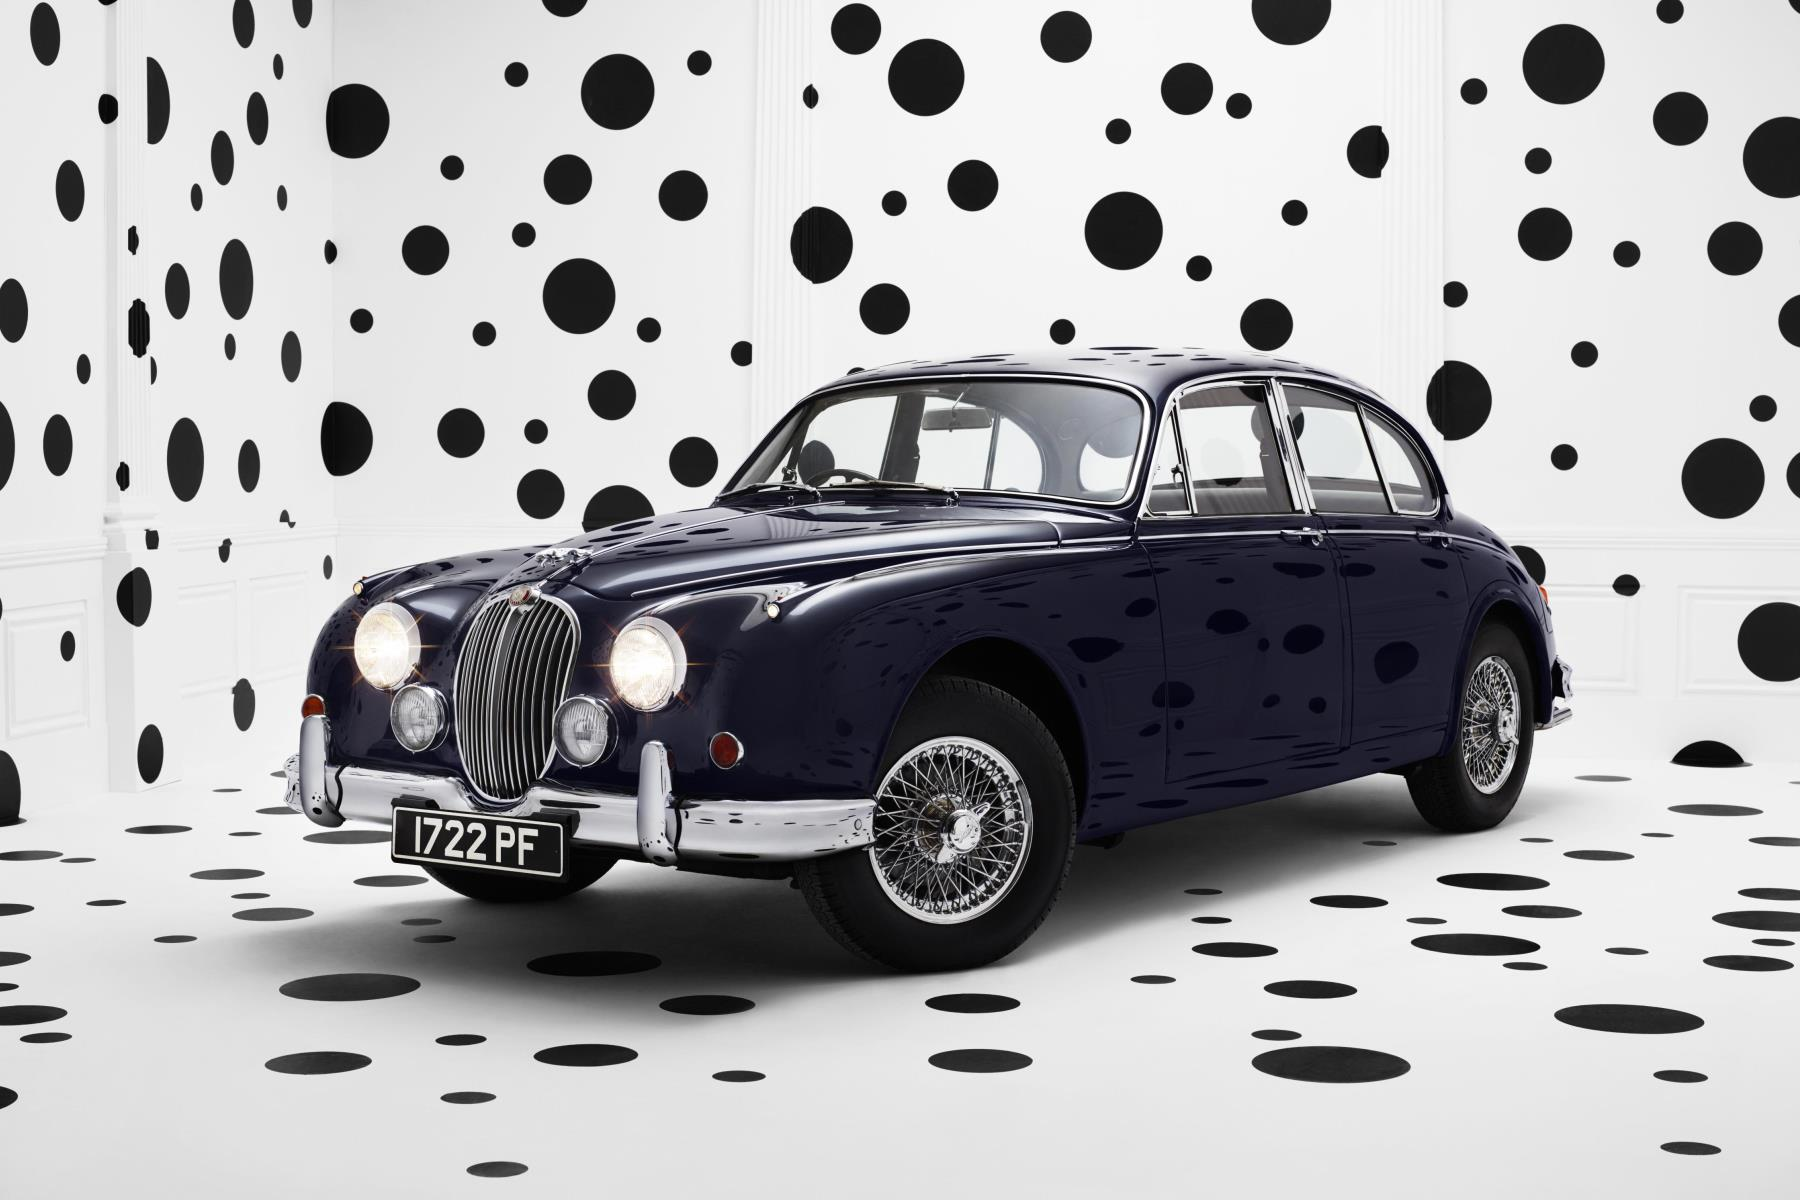 Jaguar celebrates 60th Anniversary of legendary Mk2 sports saloon with unique Rankin photograph